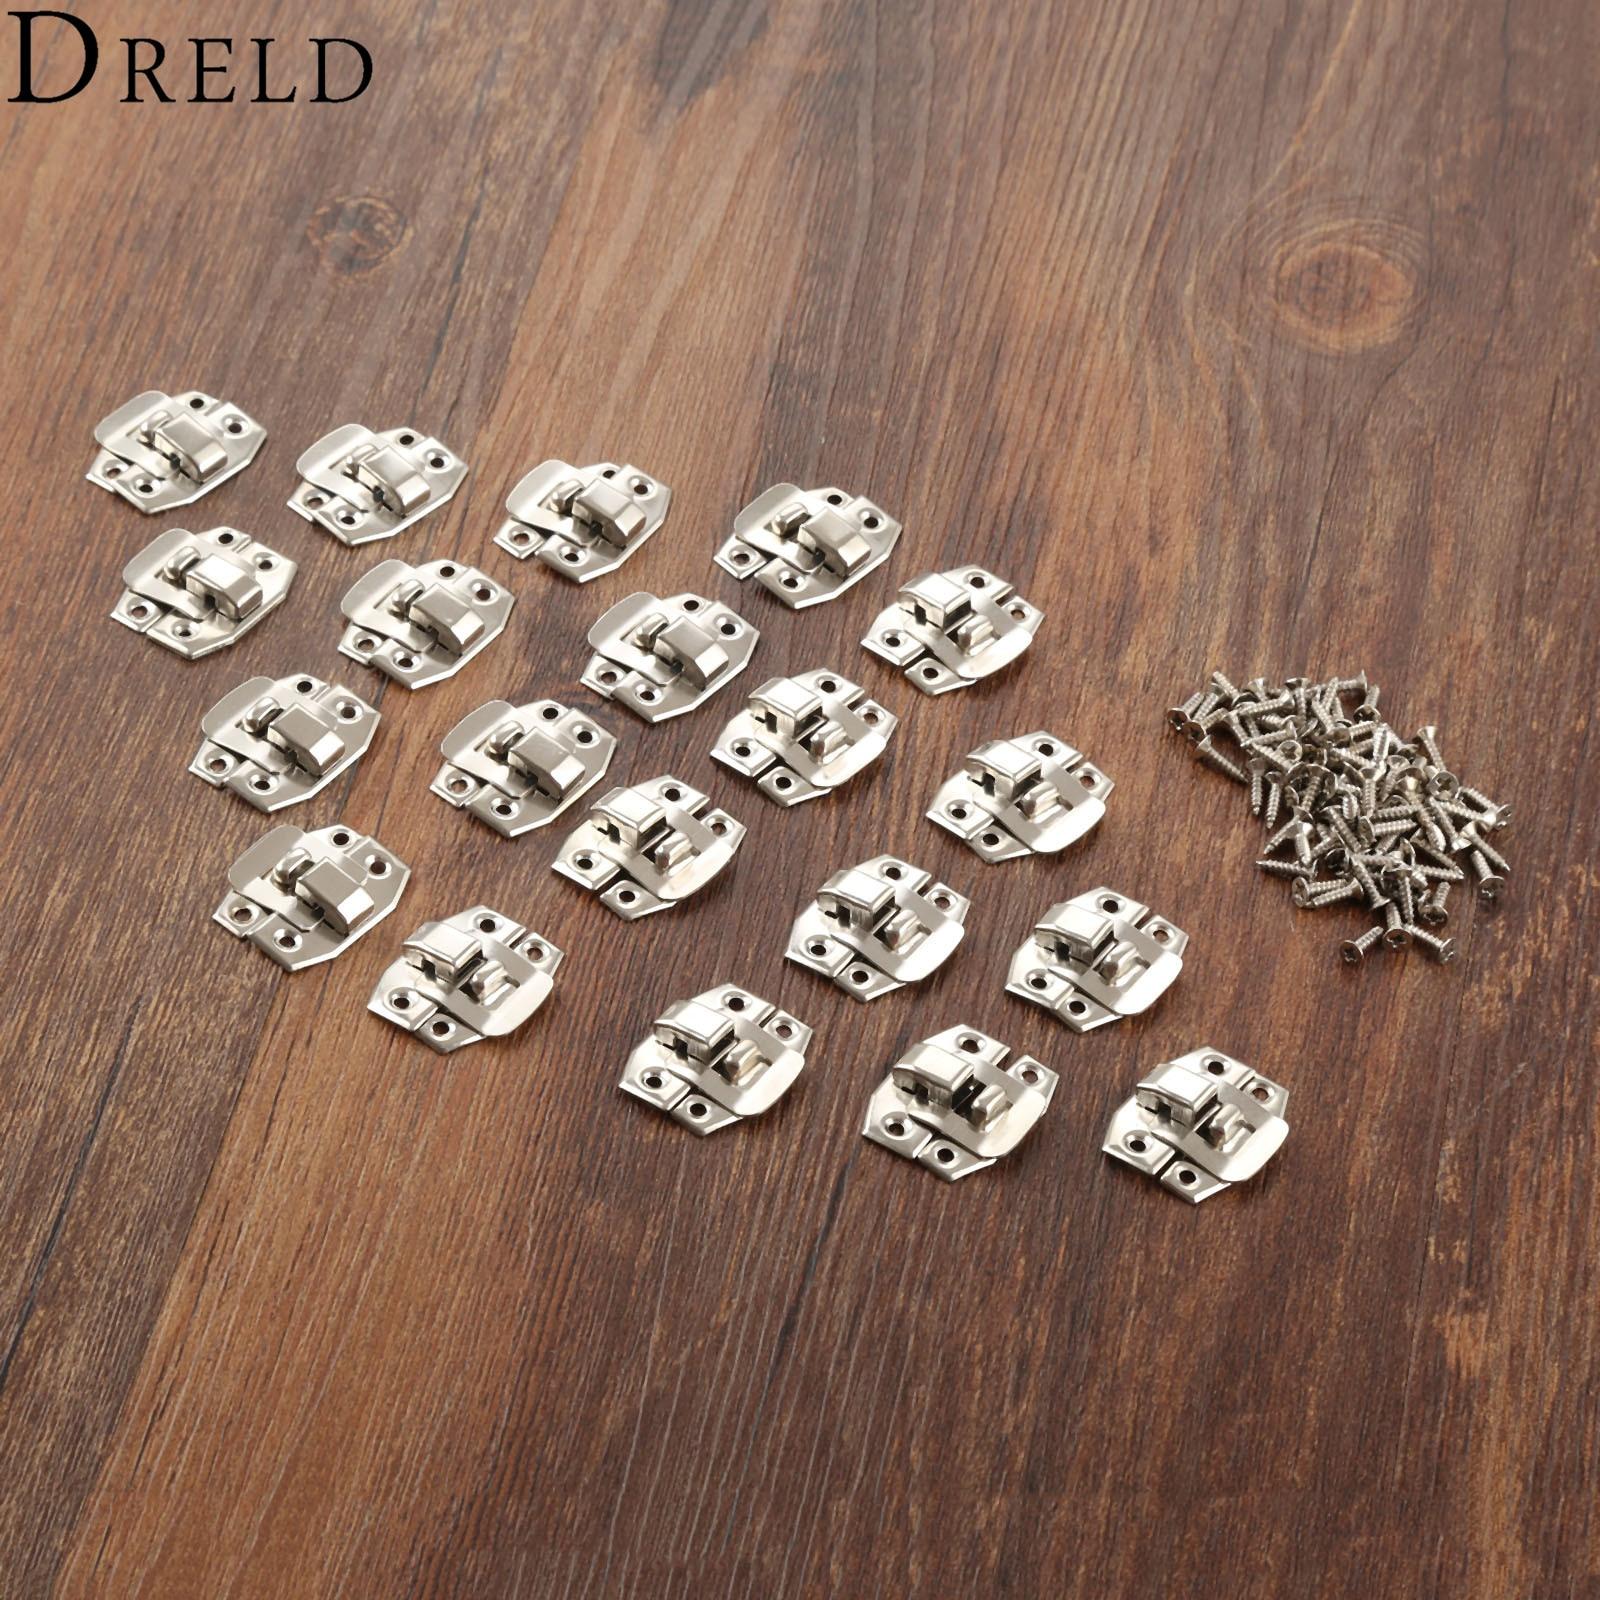 купить DRELD 20Pcs Antique Silver Box Hasp Lock Catch Latches for Jewelry Box Suitcase Buckle Clip Clasp Furniture Hardware 24*19mm по цене 135.32 рублей